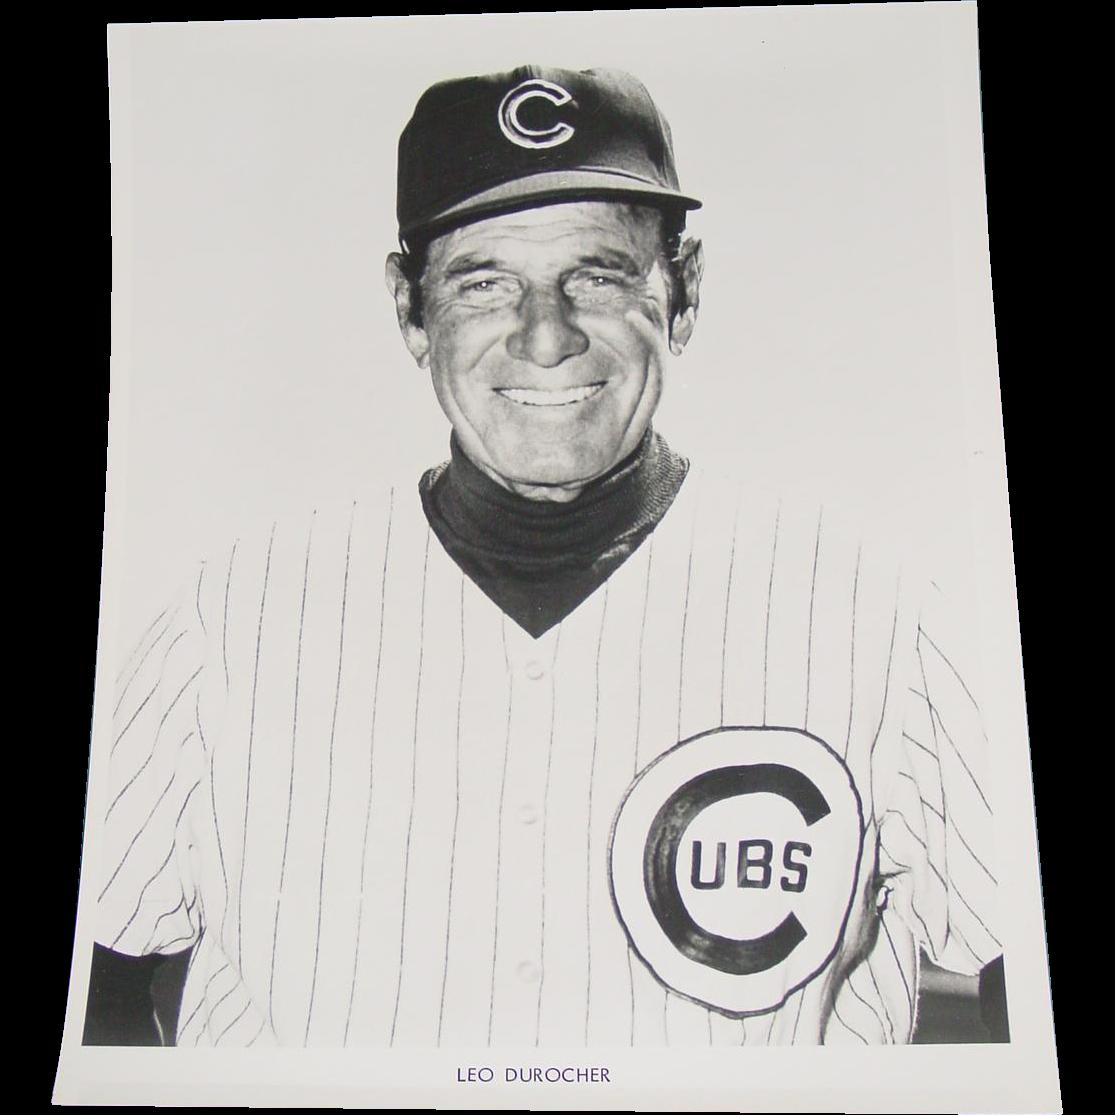 Chicago Cubs 1969 Leo Durocher Baseball Original Press Photograph MLB 8 X 10 BW